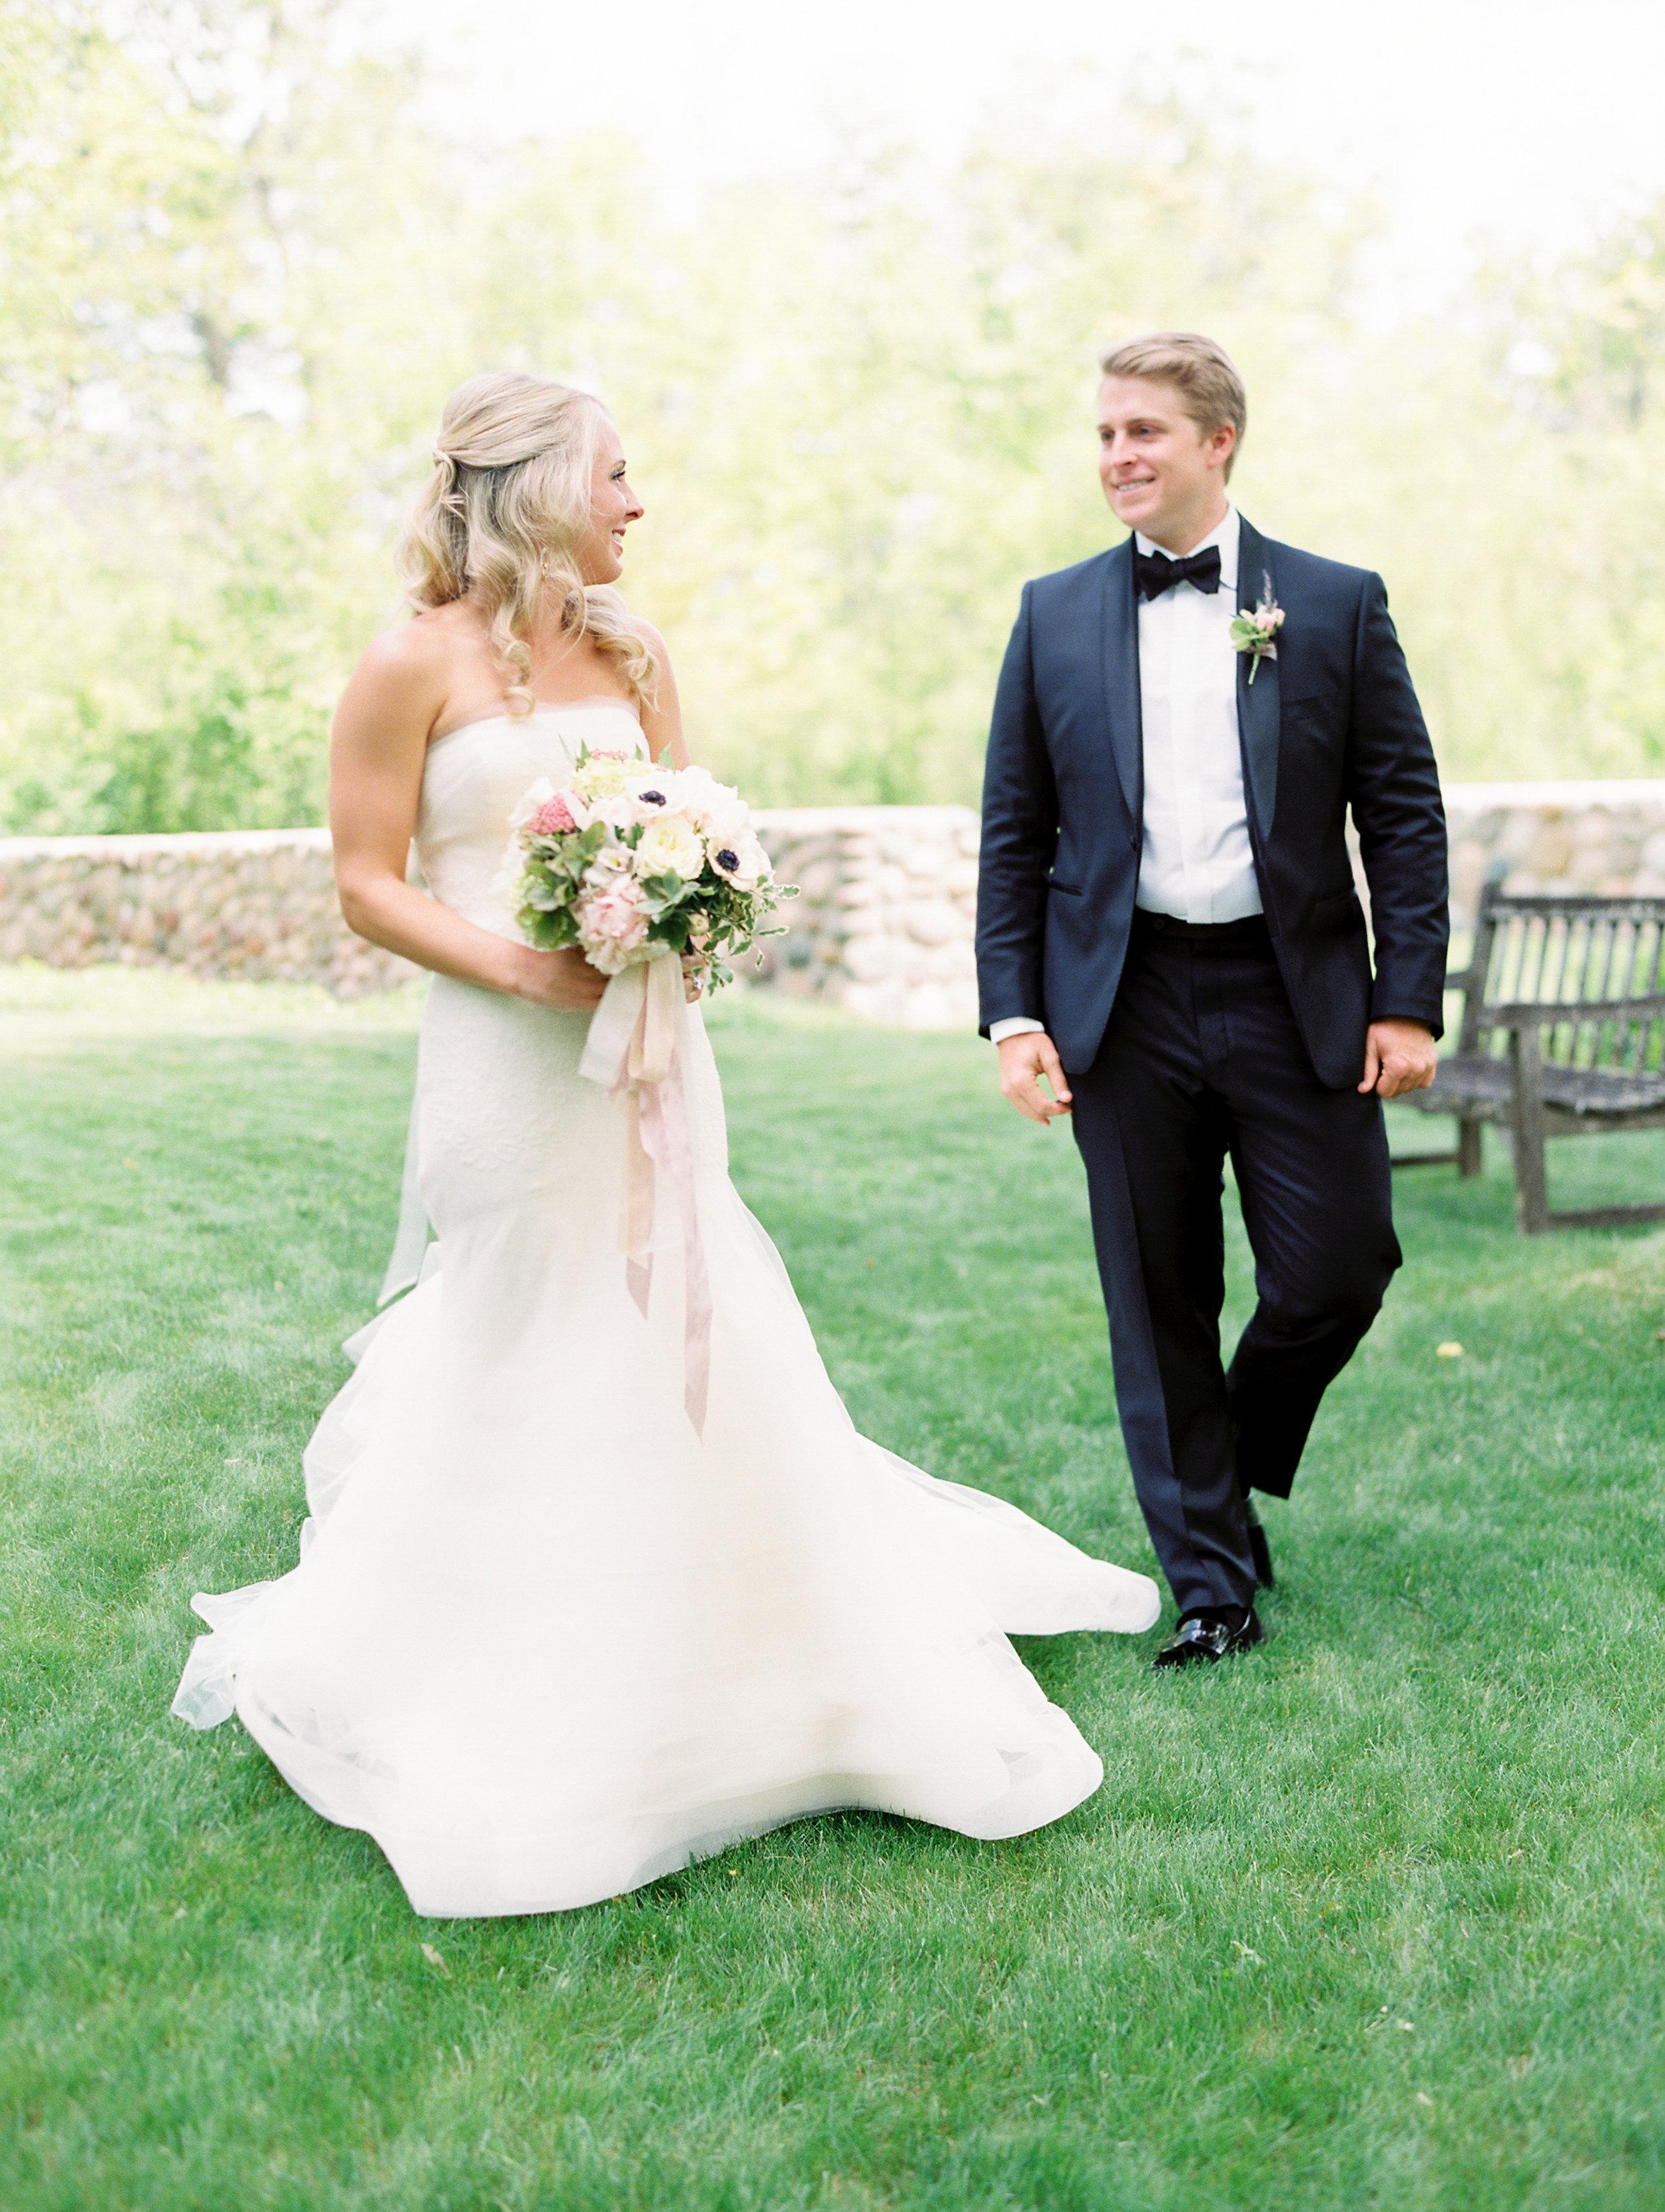 Coffman+Wedding+First+Look-21.jpg